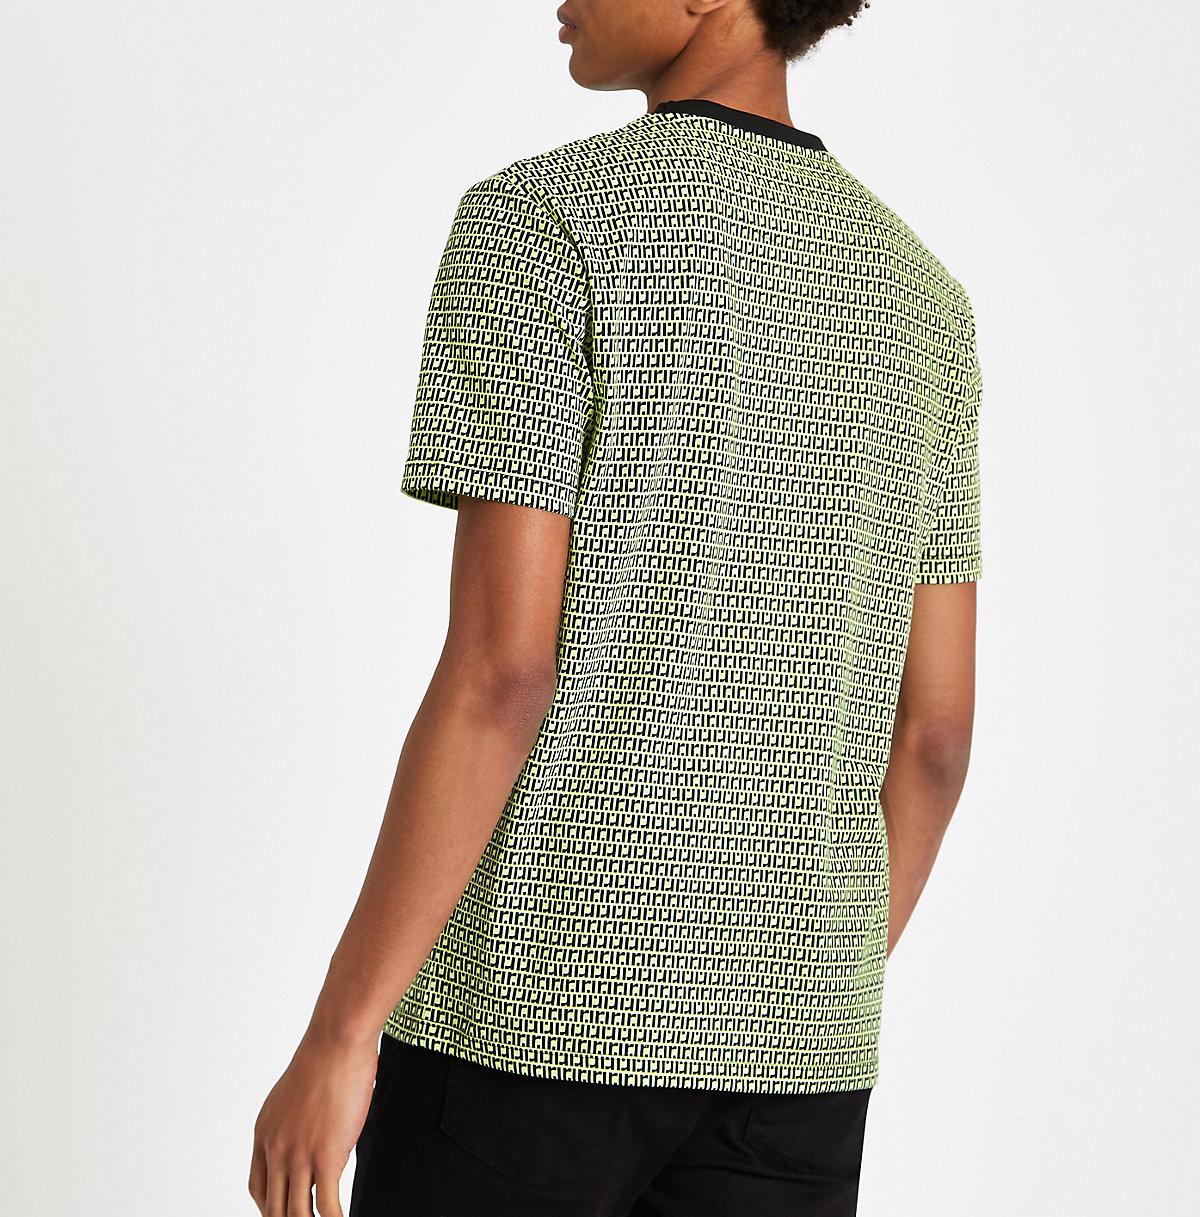 Neon Green Slim Fit Ri Monogram T Shirt T Shirts T Shirts